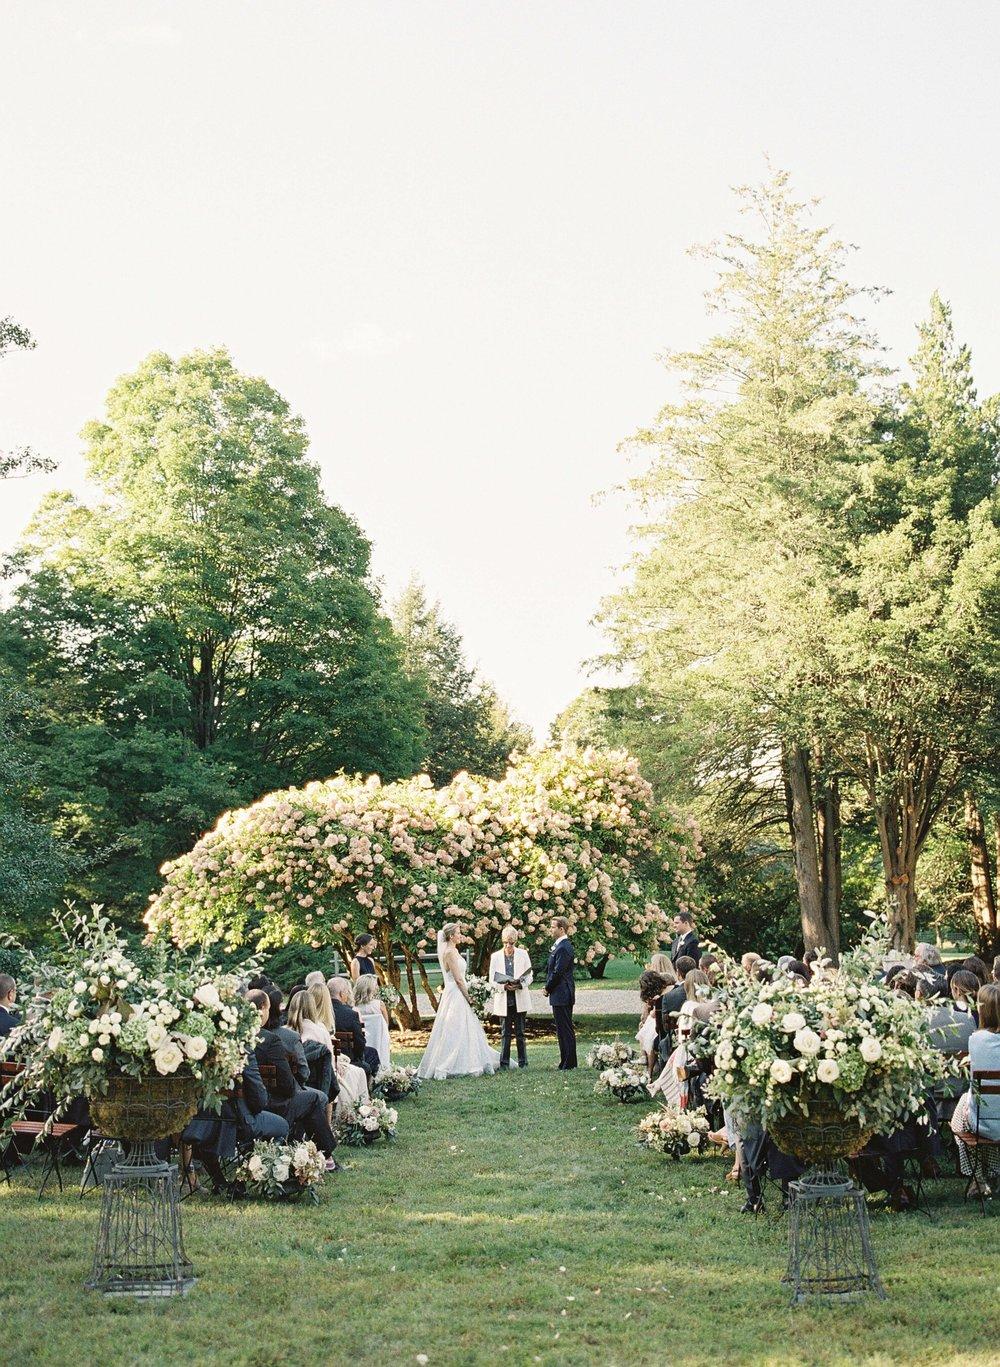 Connecticut-Wedding-28-Jen-Huang-20170909-KB-258-Jen_Huang-006799-R1-025.jpg